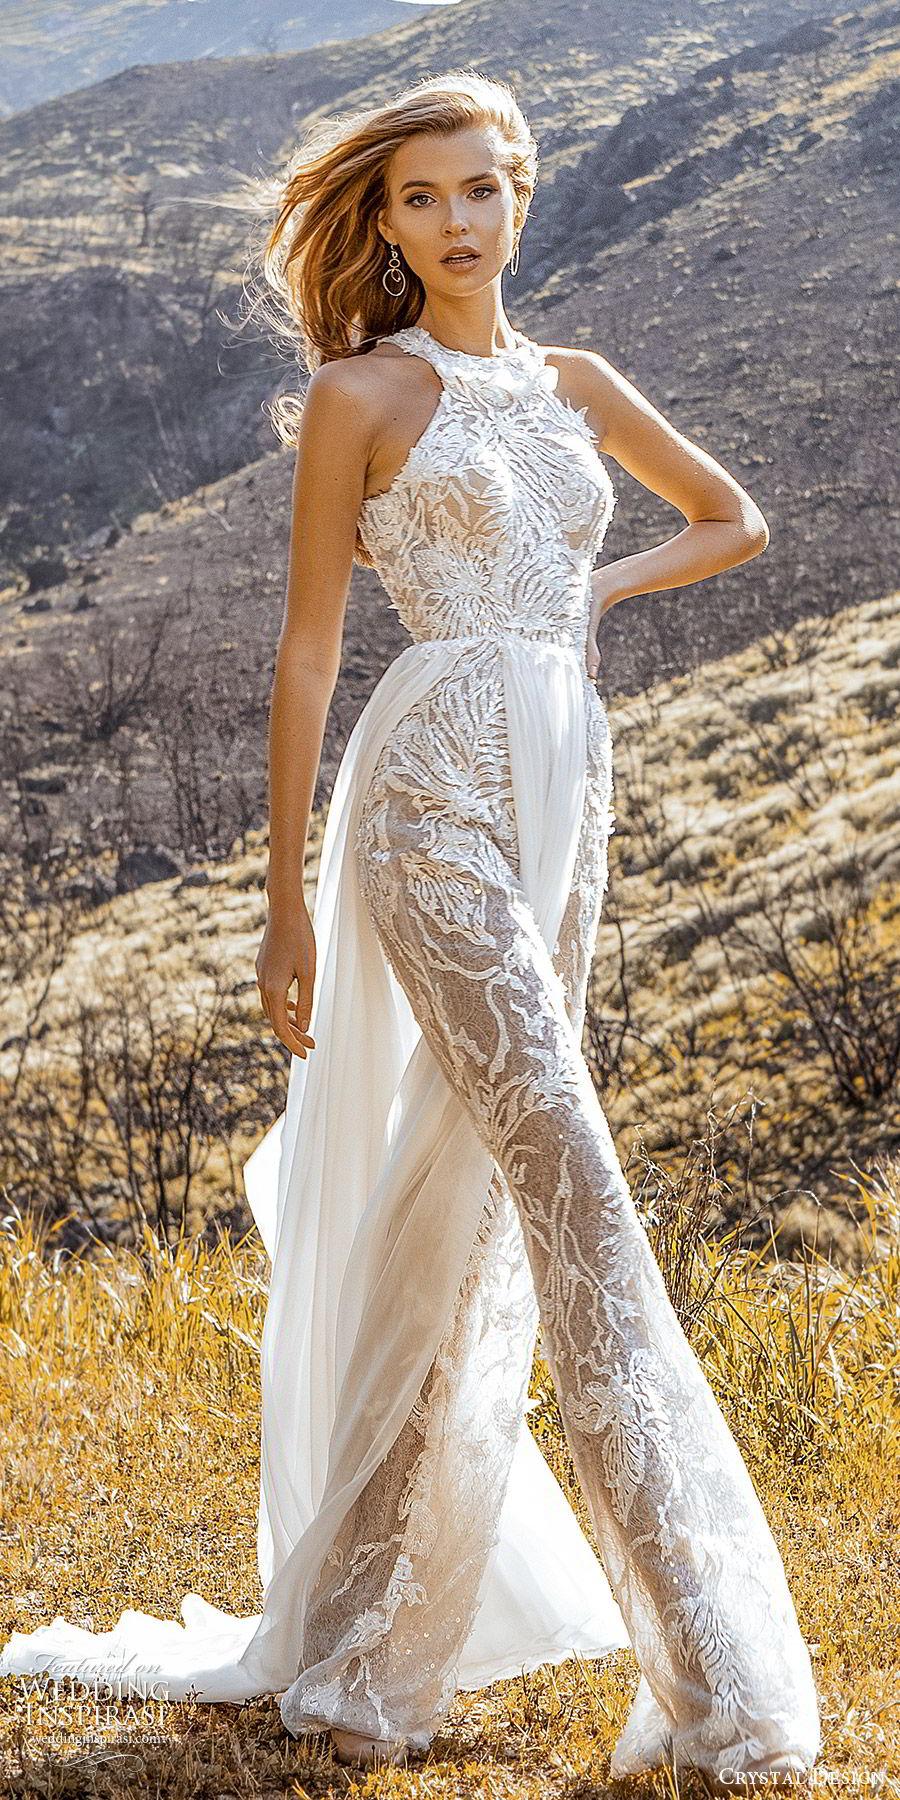 crystal design 2020 couture bridal sleeveless halter neckline jumpsuit wedding dress a line skirt slit (5) modern chic romantic sv